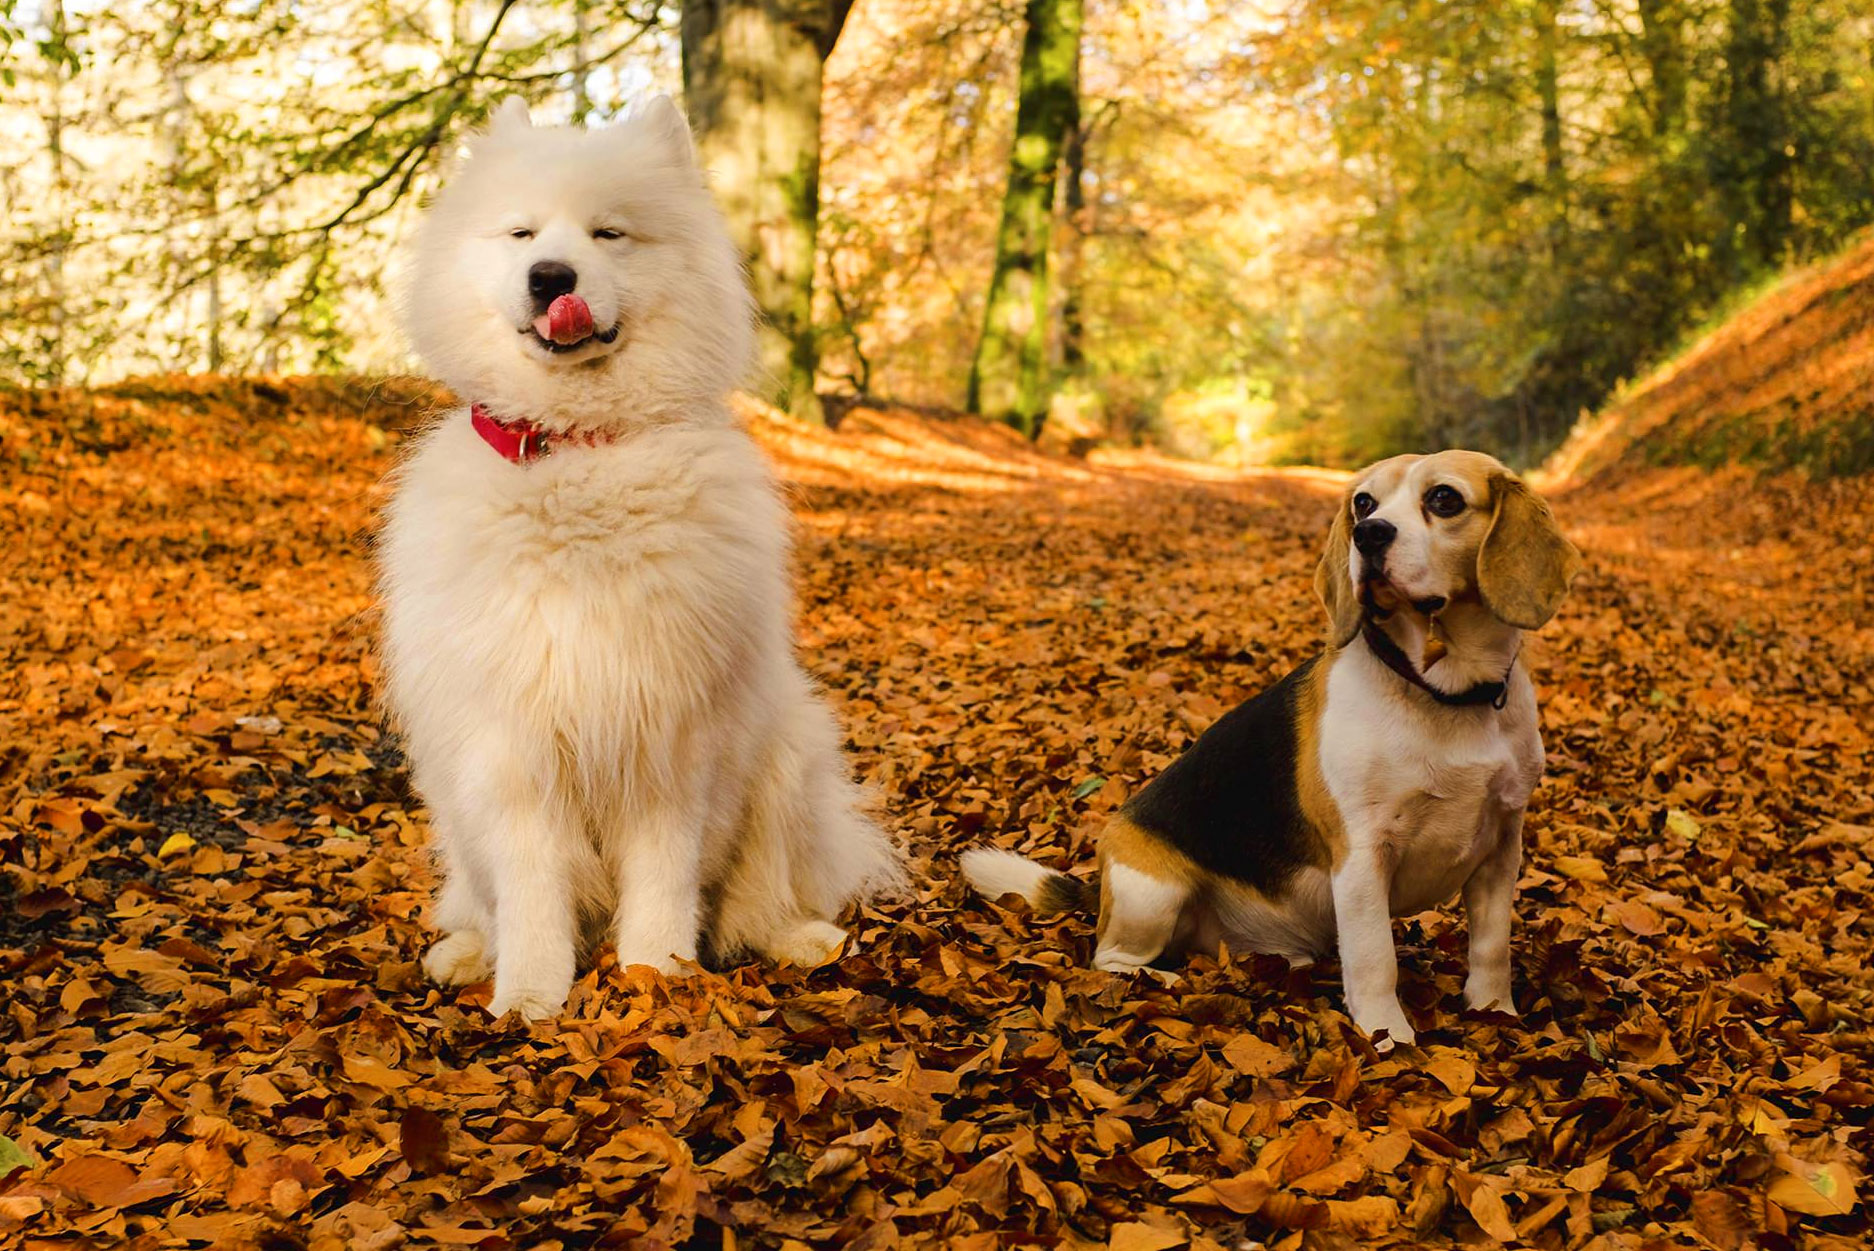 Beagle and the bear